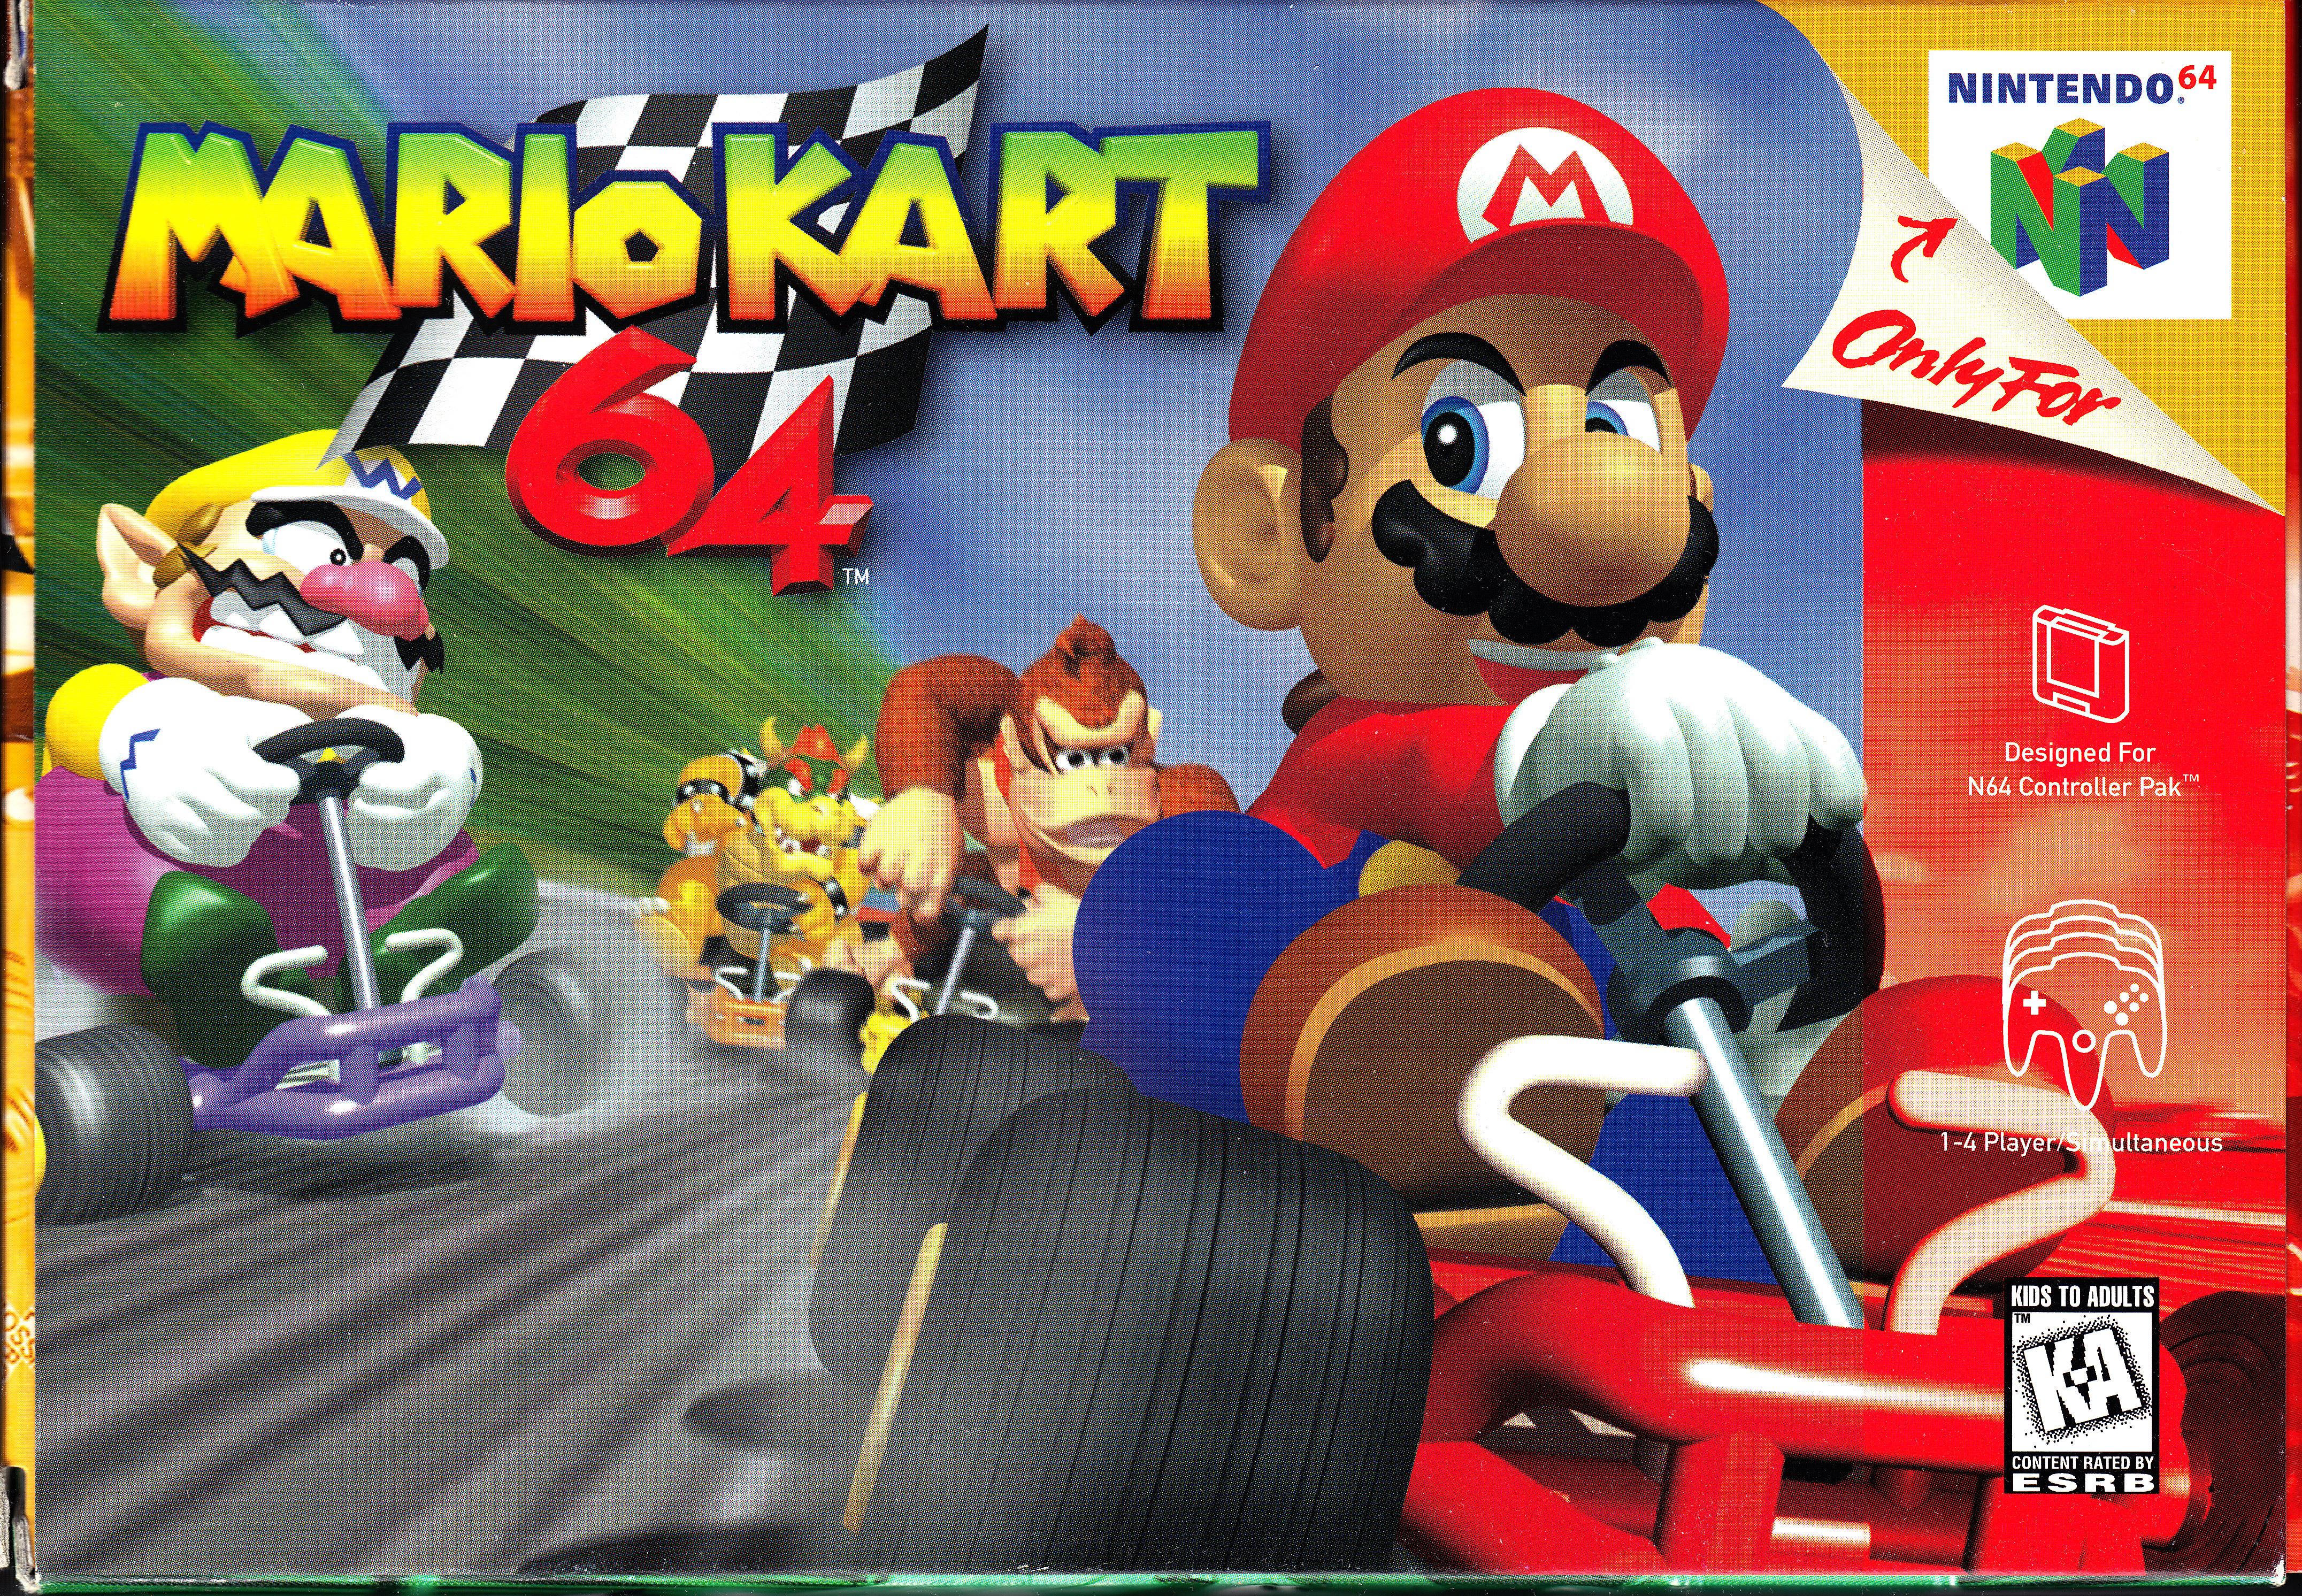 Nintendo 64 Mario Kart 64 Front Cover.jpg